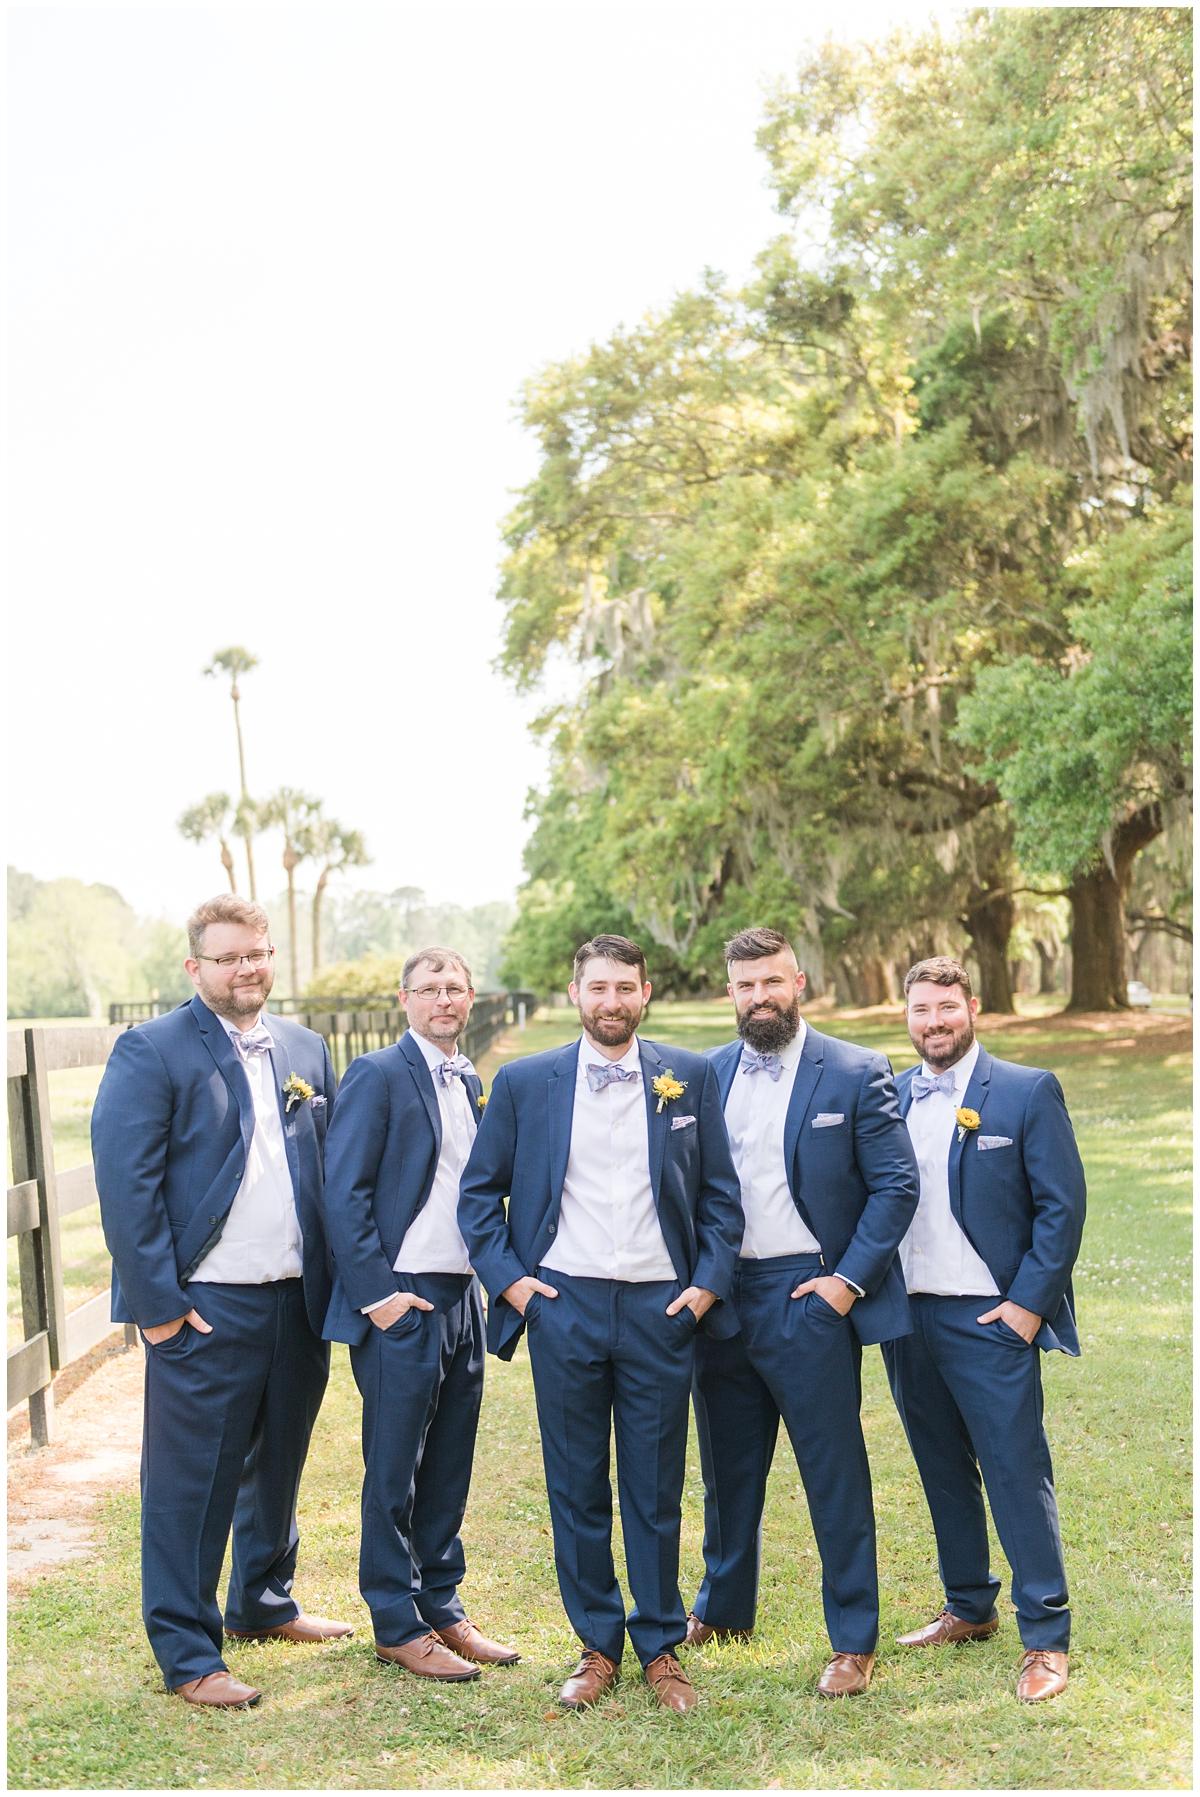 groom poses with groomsmen in navy suits